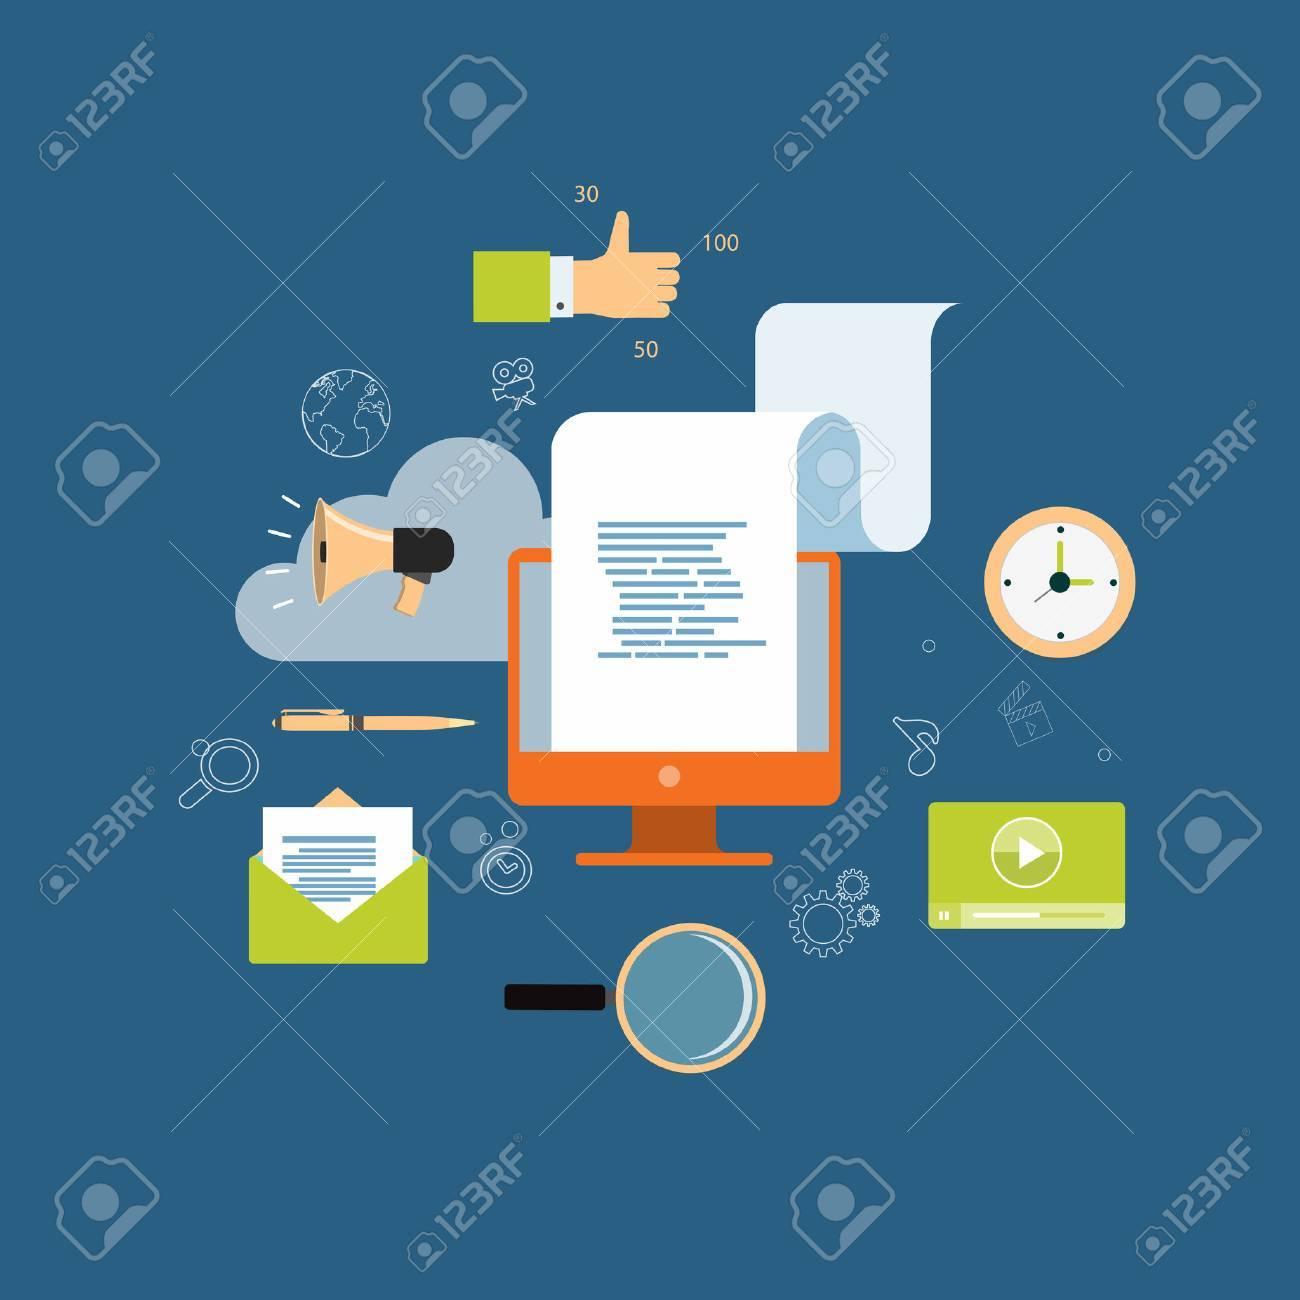 digital content marketing for business online background - 39445383